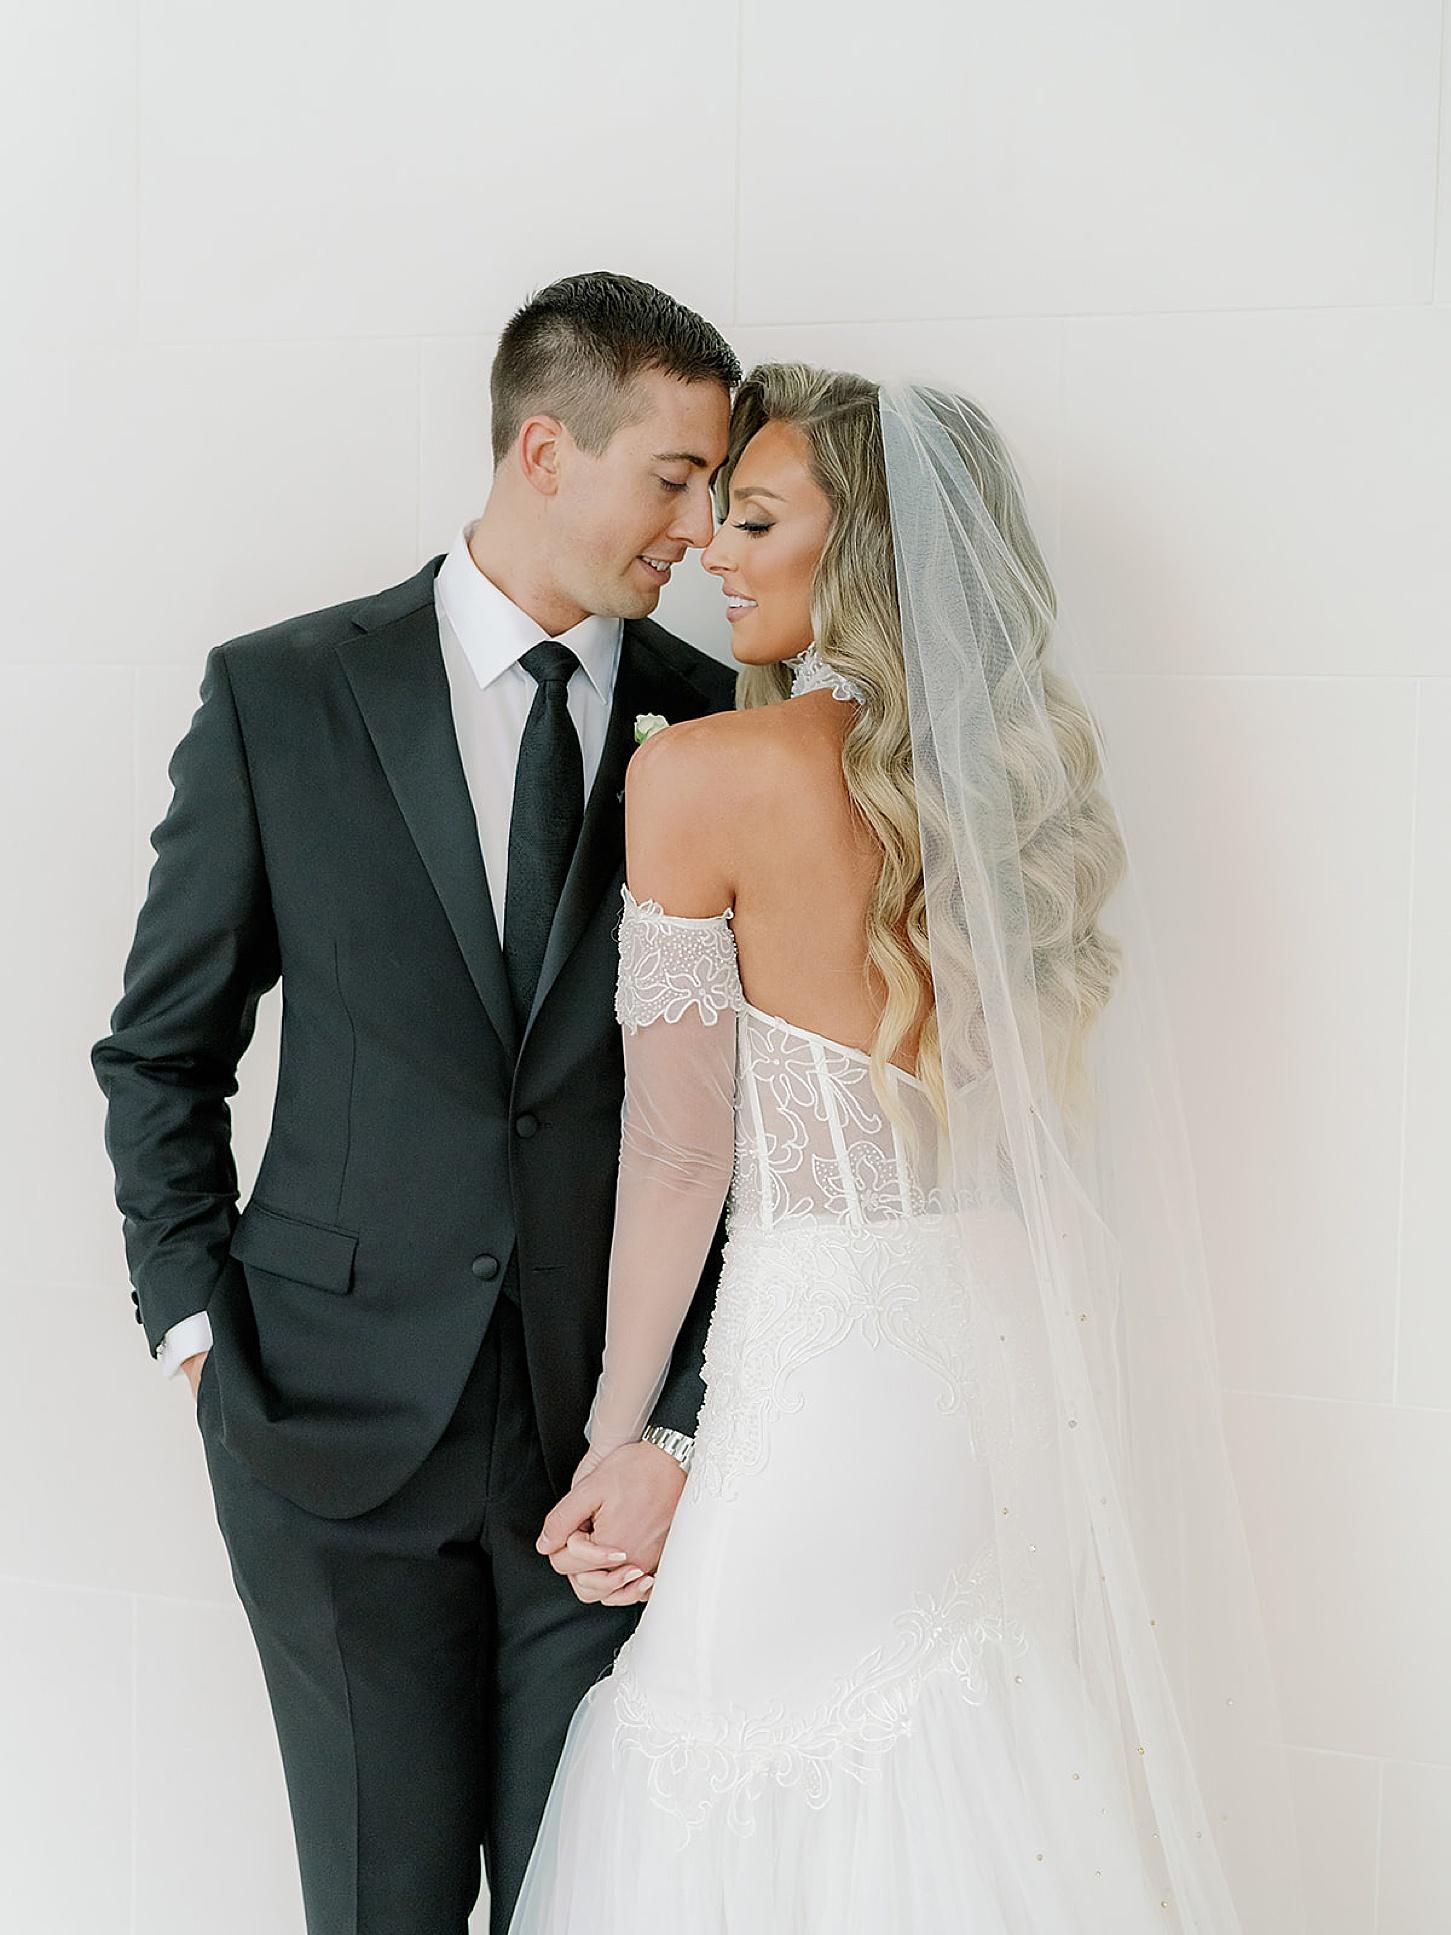 Atlantic City Wedding Photography Studio by Magdalena Studios Lexy Cha 0061